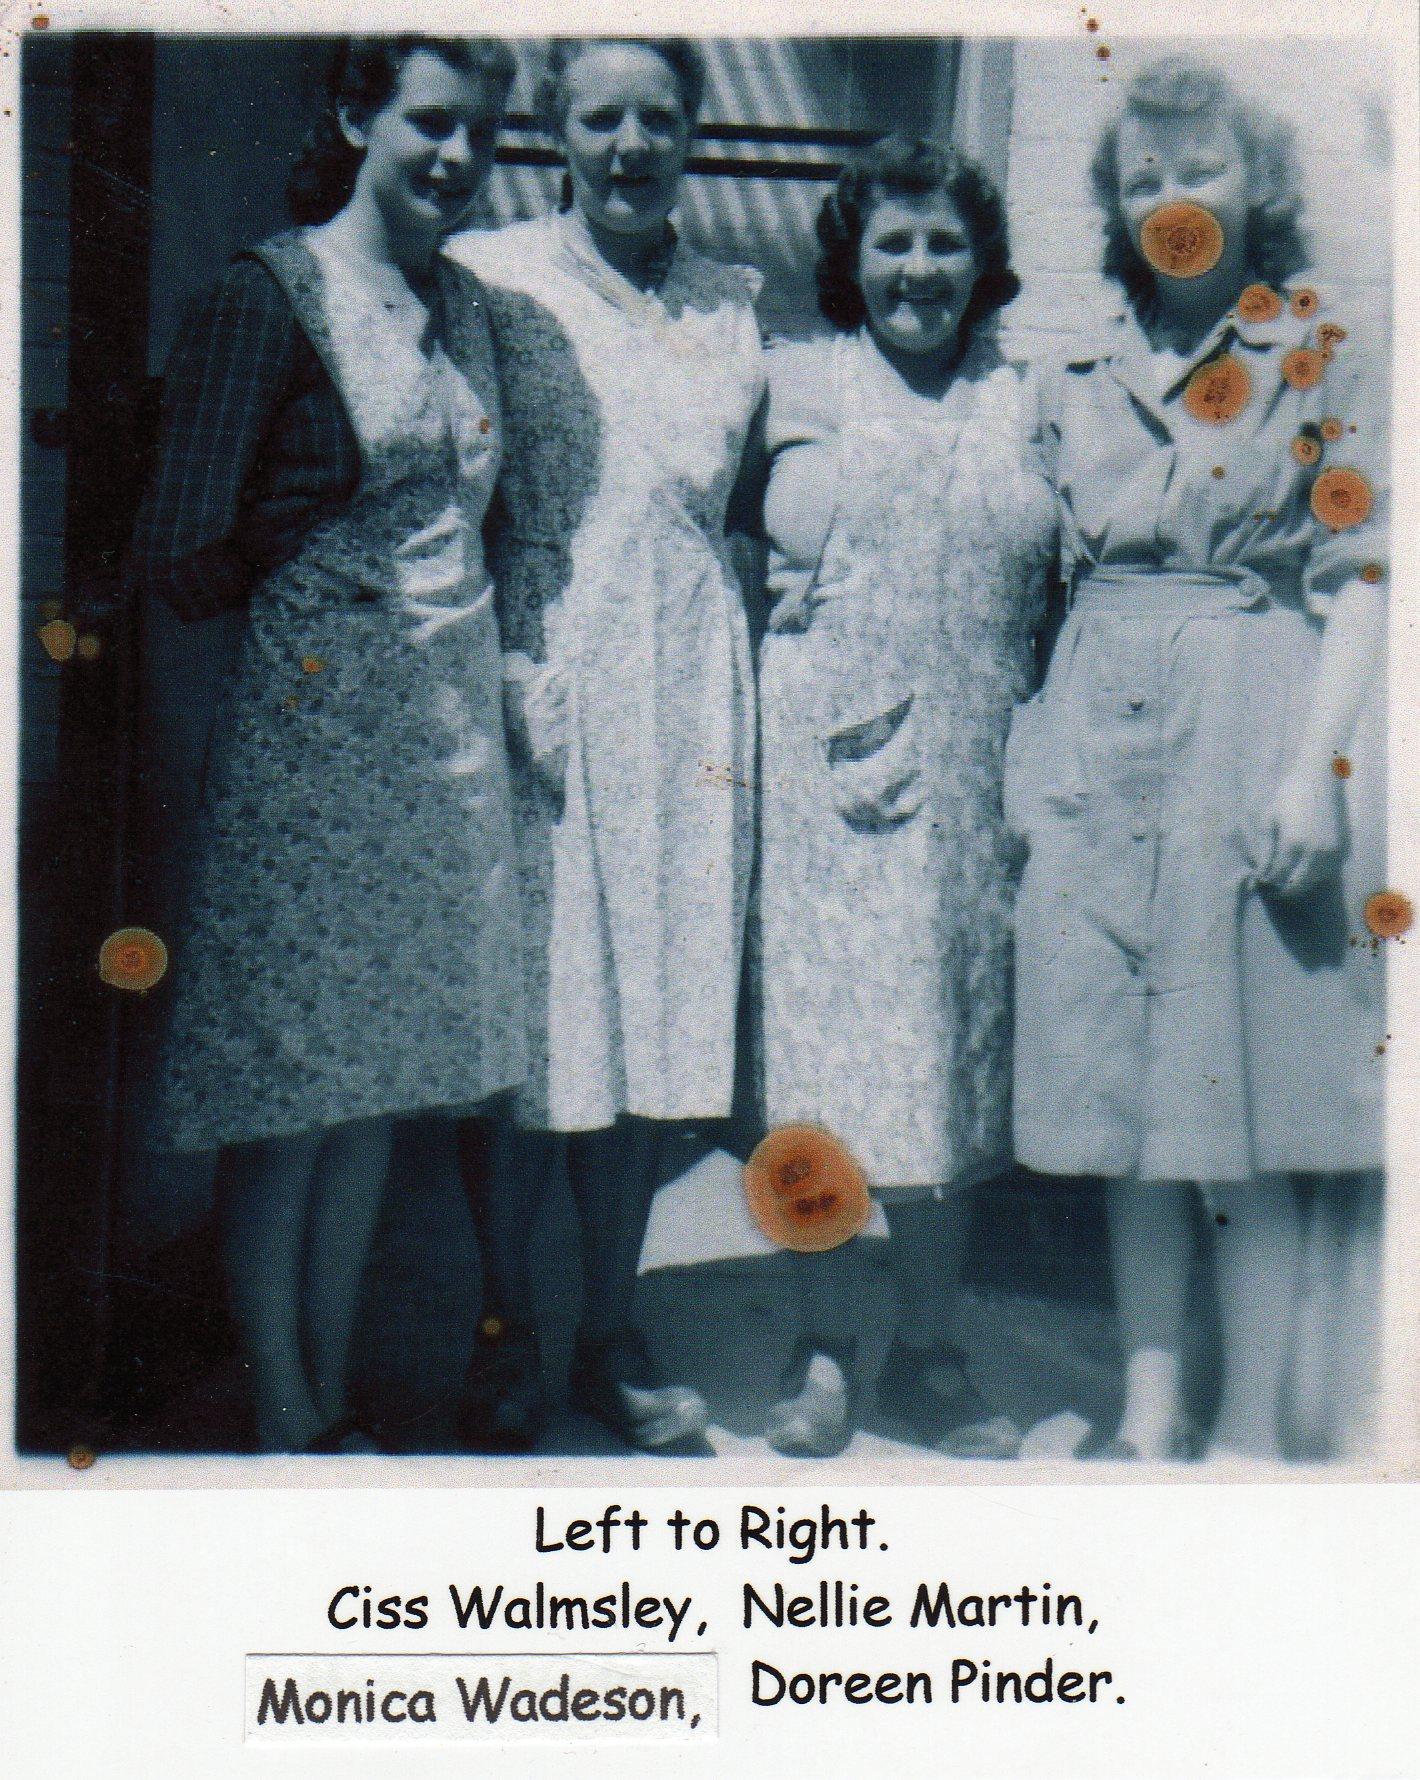 Berry's Ladies, Ciss Walmsley, Nellie Martin Monica Wadeson, Doreen Pinder